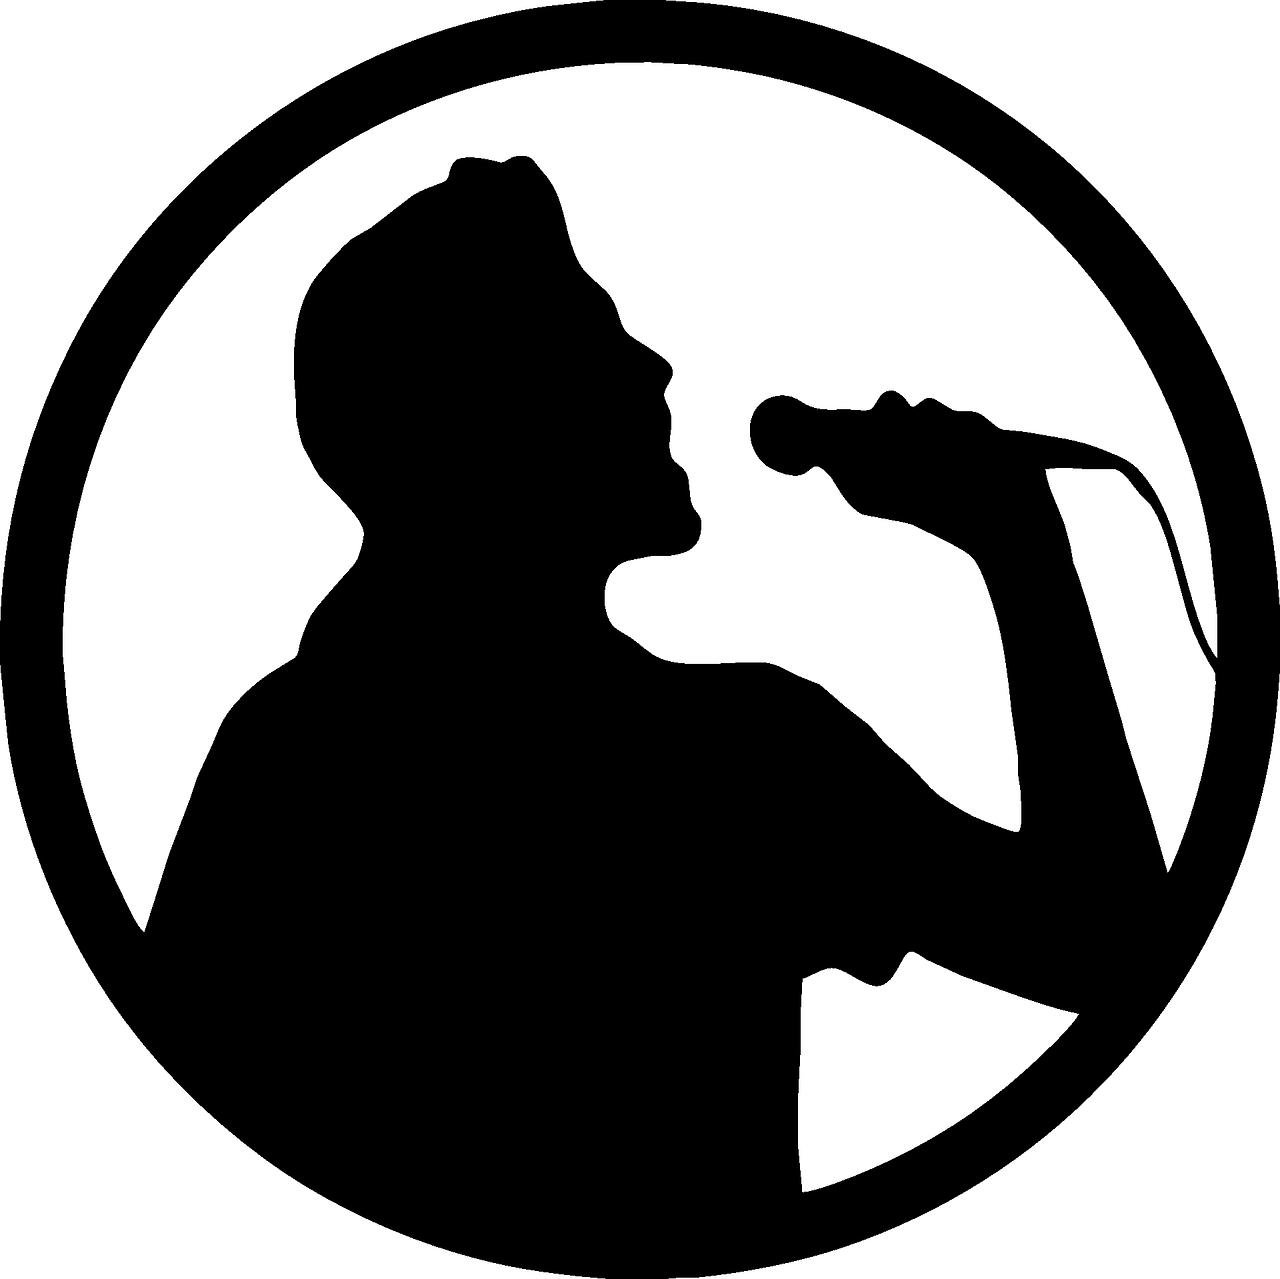 Microphone clipart group. Karaoke logo singer transparent